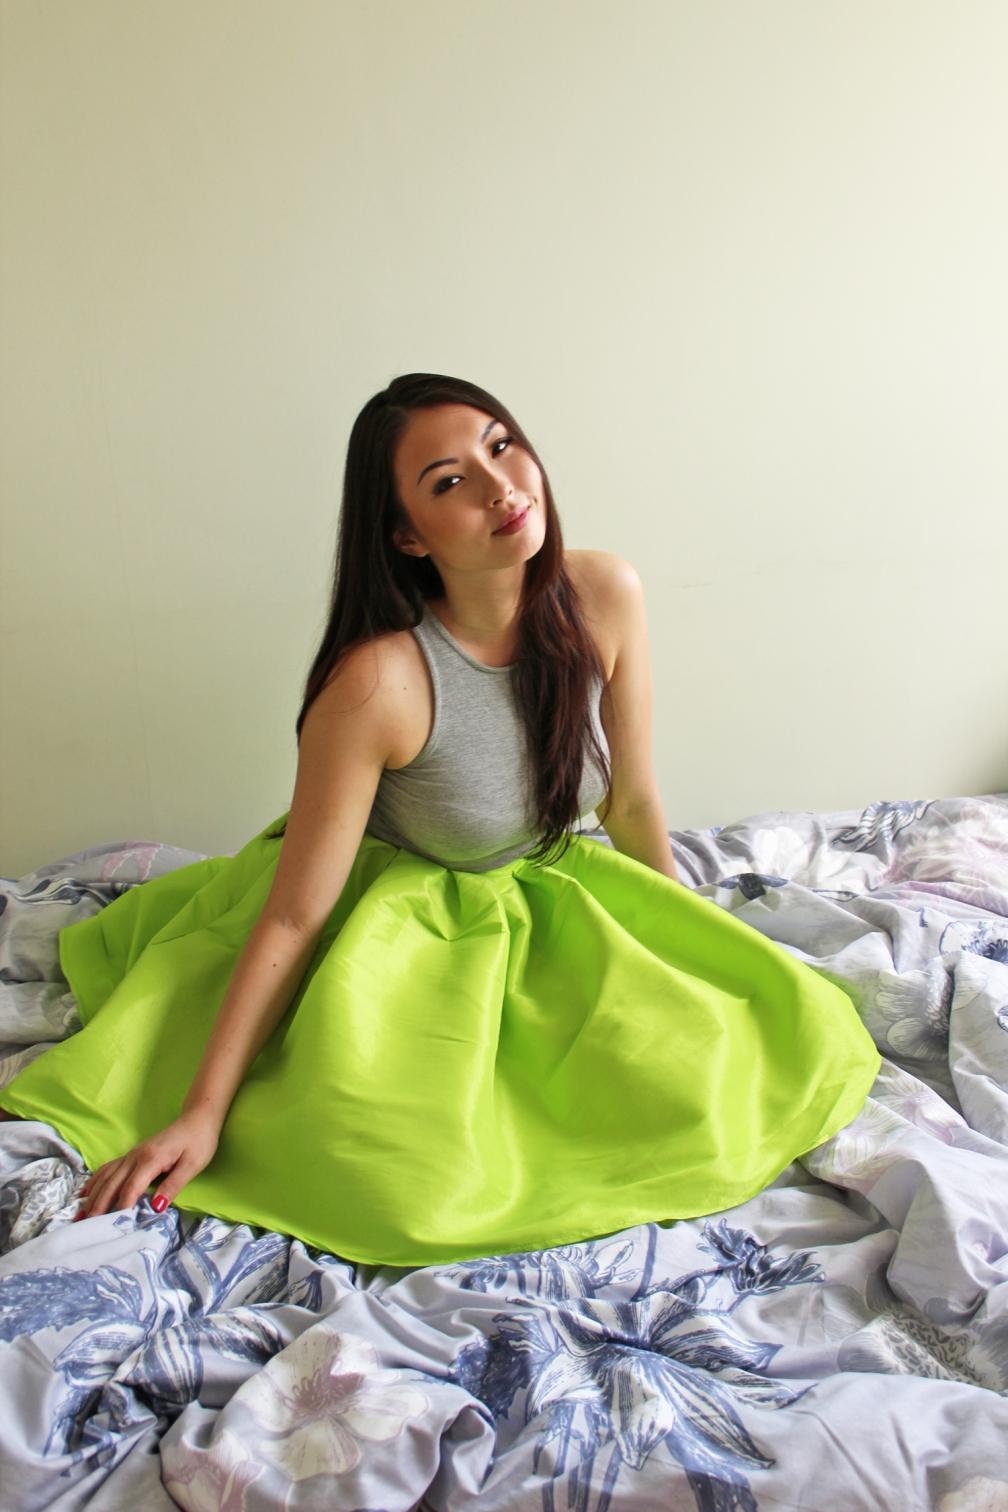 Dandy Skirt in Neon Lime. Silk polyester blend. $60